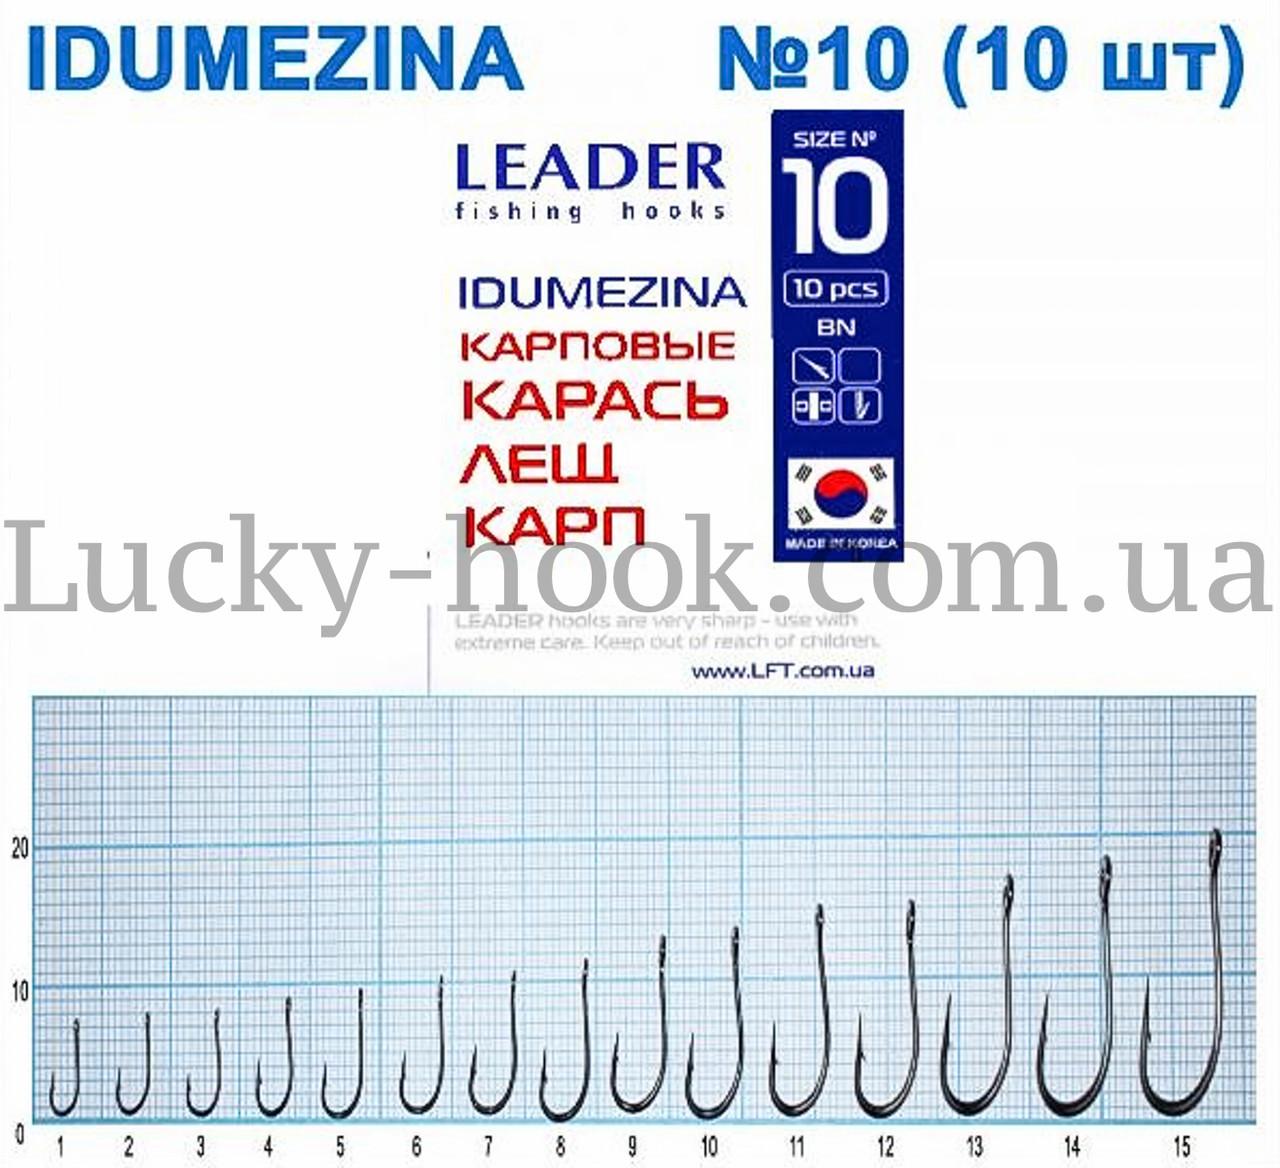 Крючок Leader Idumezina (карась, лещ, карп) № 10